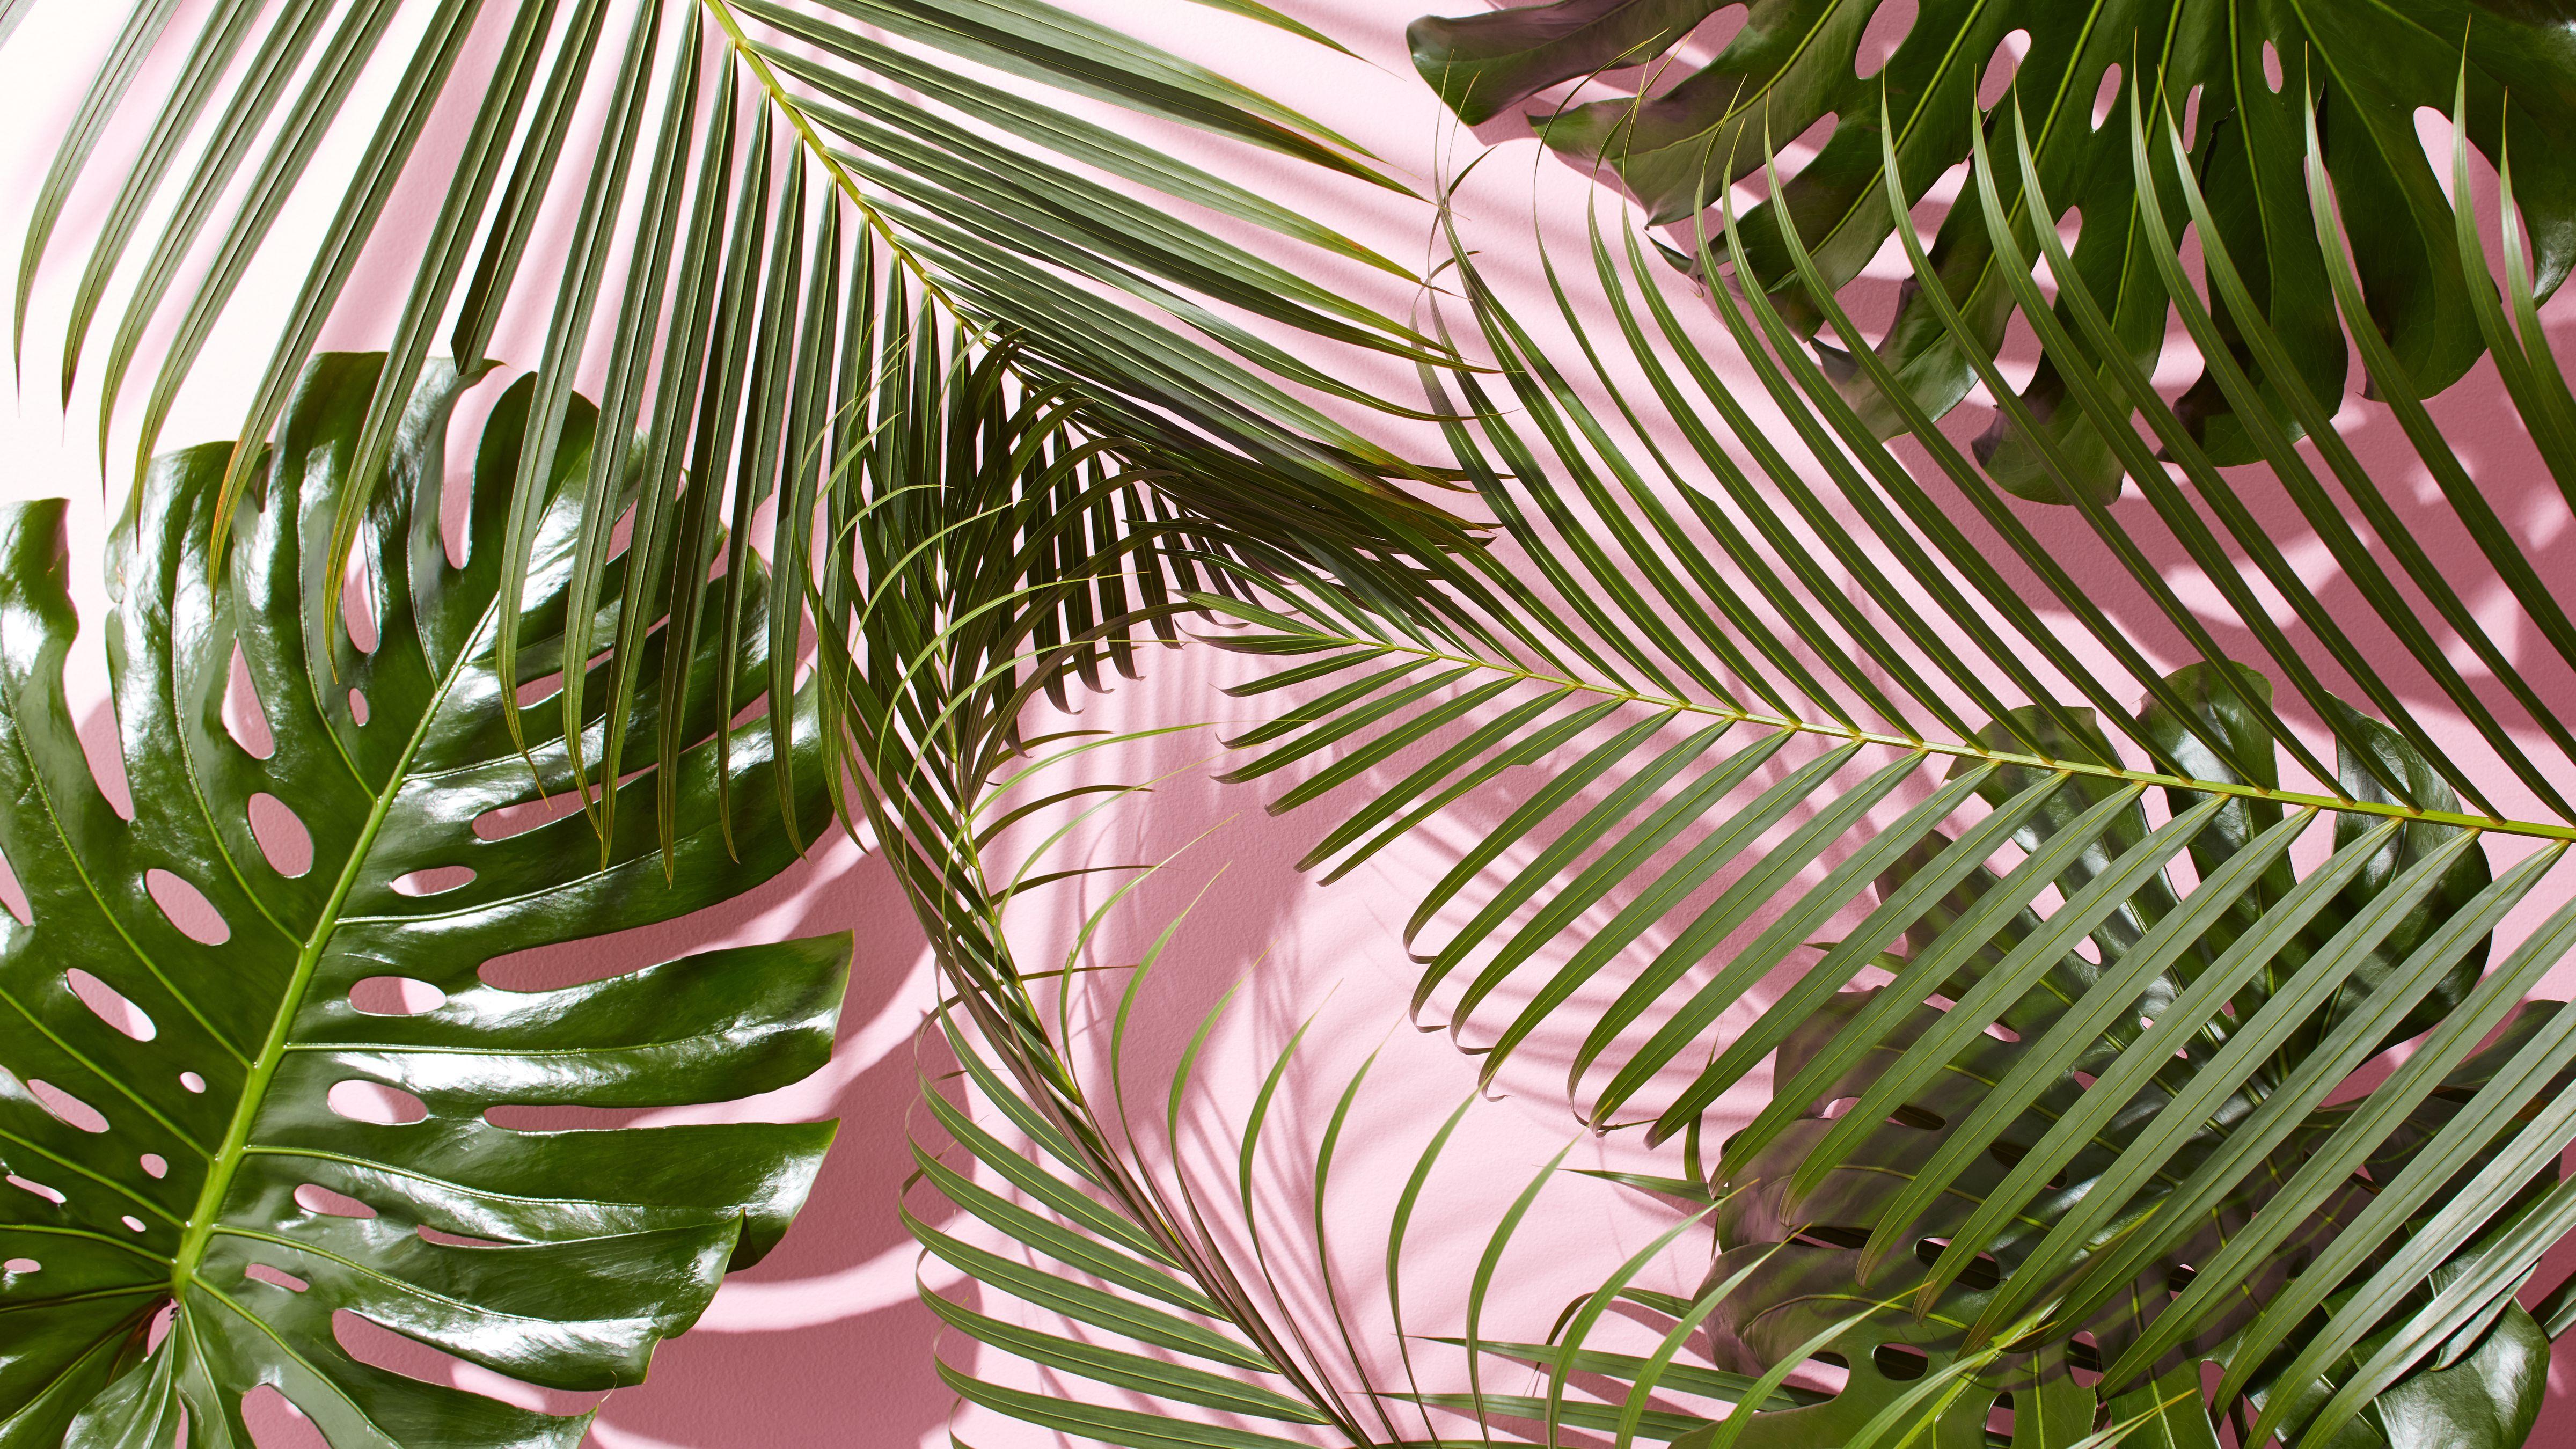 55 Tropical Leaves Desktop Wallpapers   Download at WallpaperBro 4800x2700